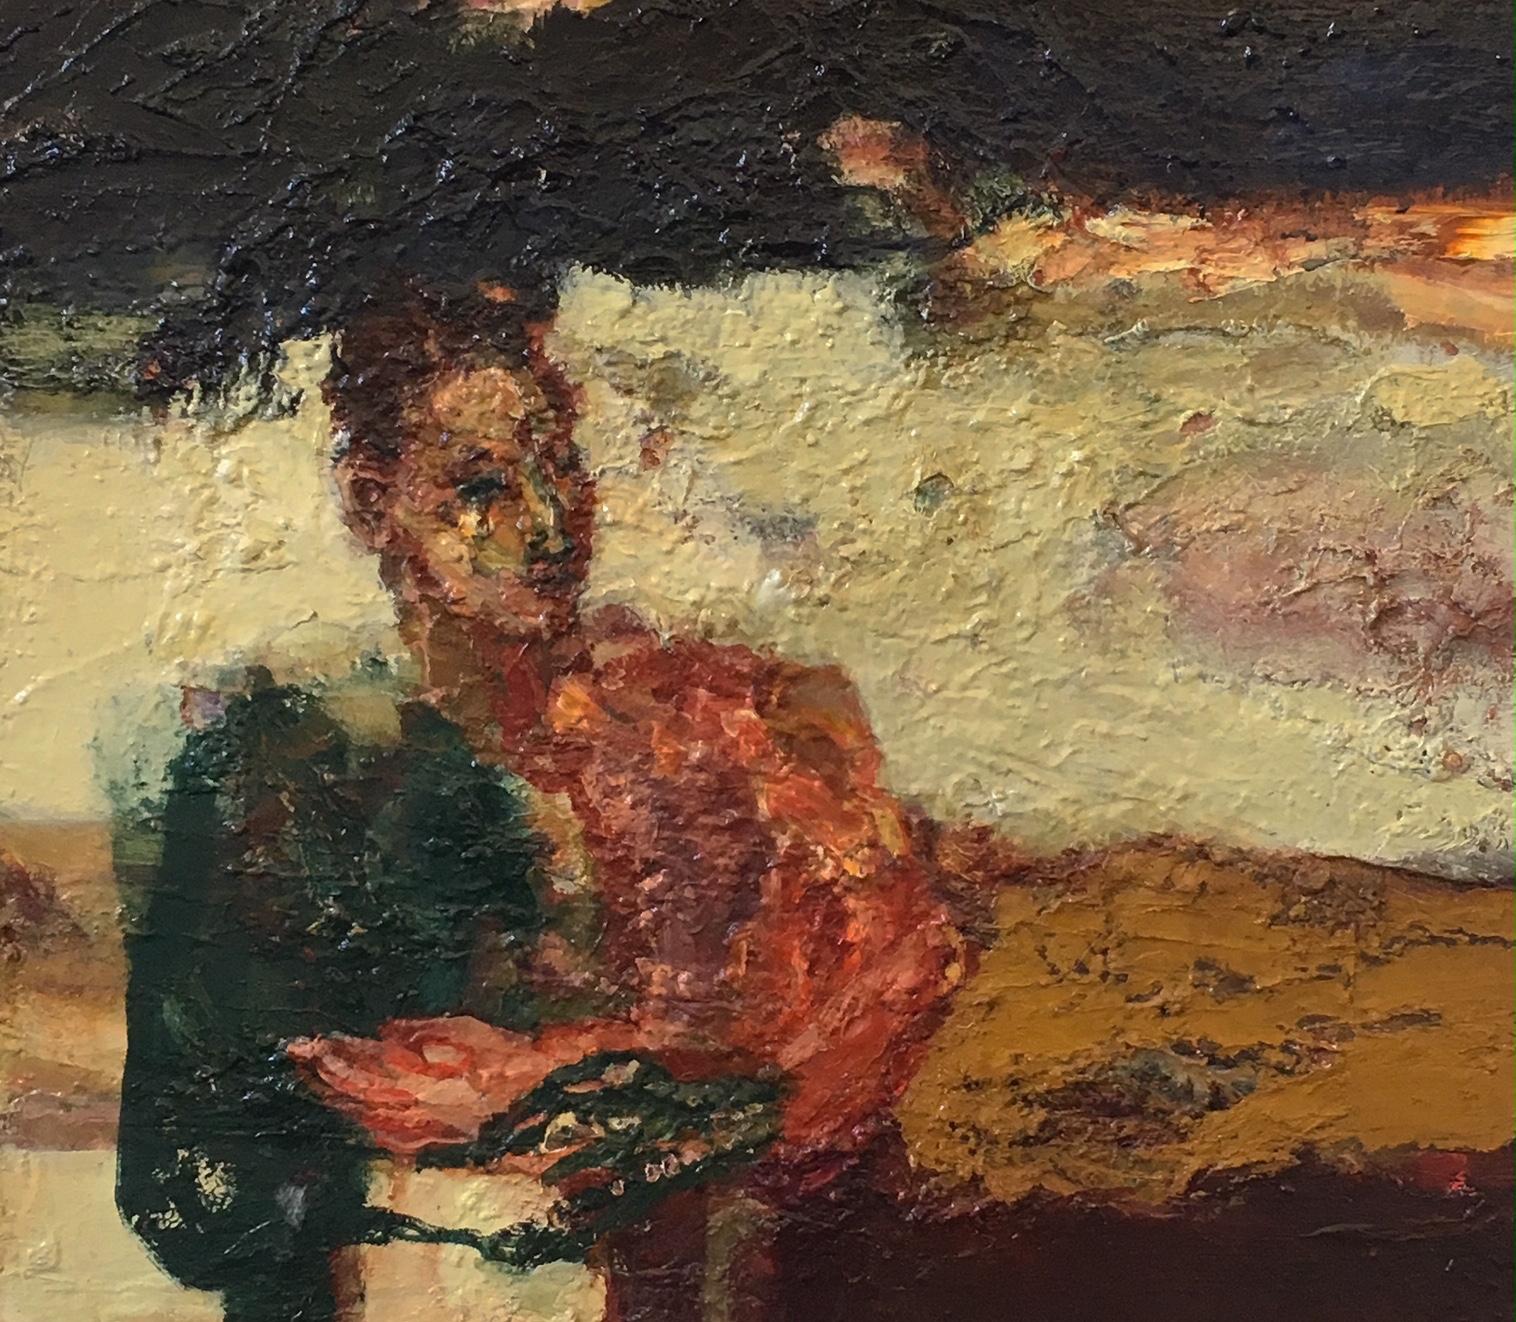 Title: Tinctoria Gorse  Size: 65 x 70 cm  Medium: Oil on canvas  price: £1600